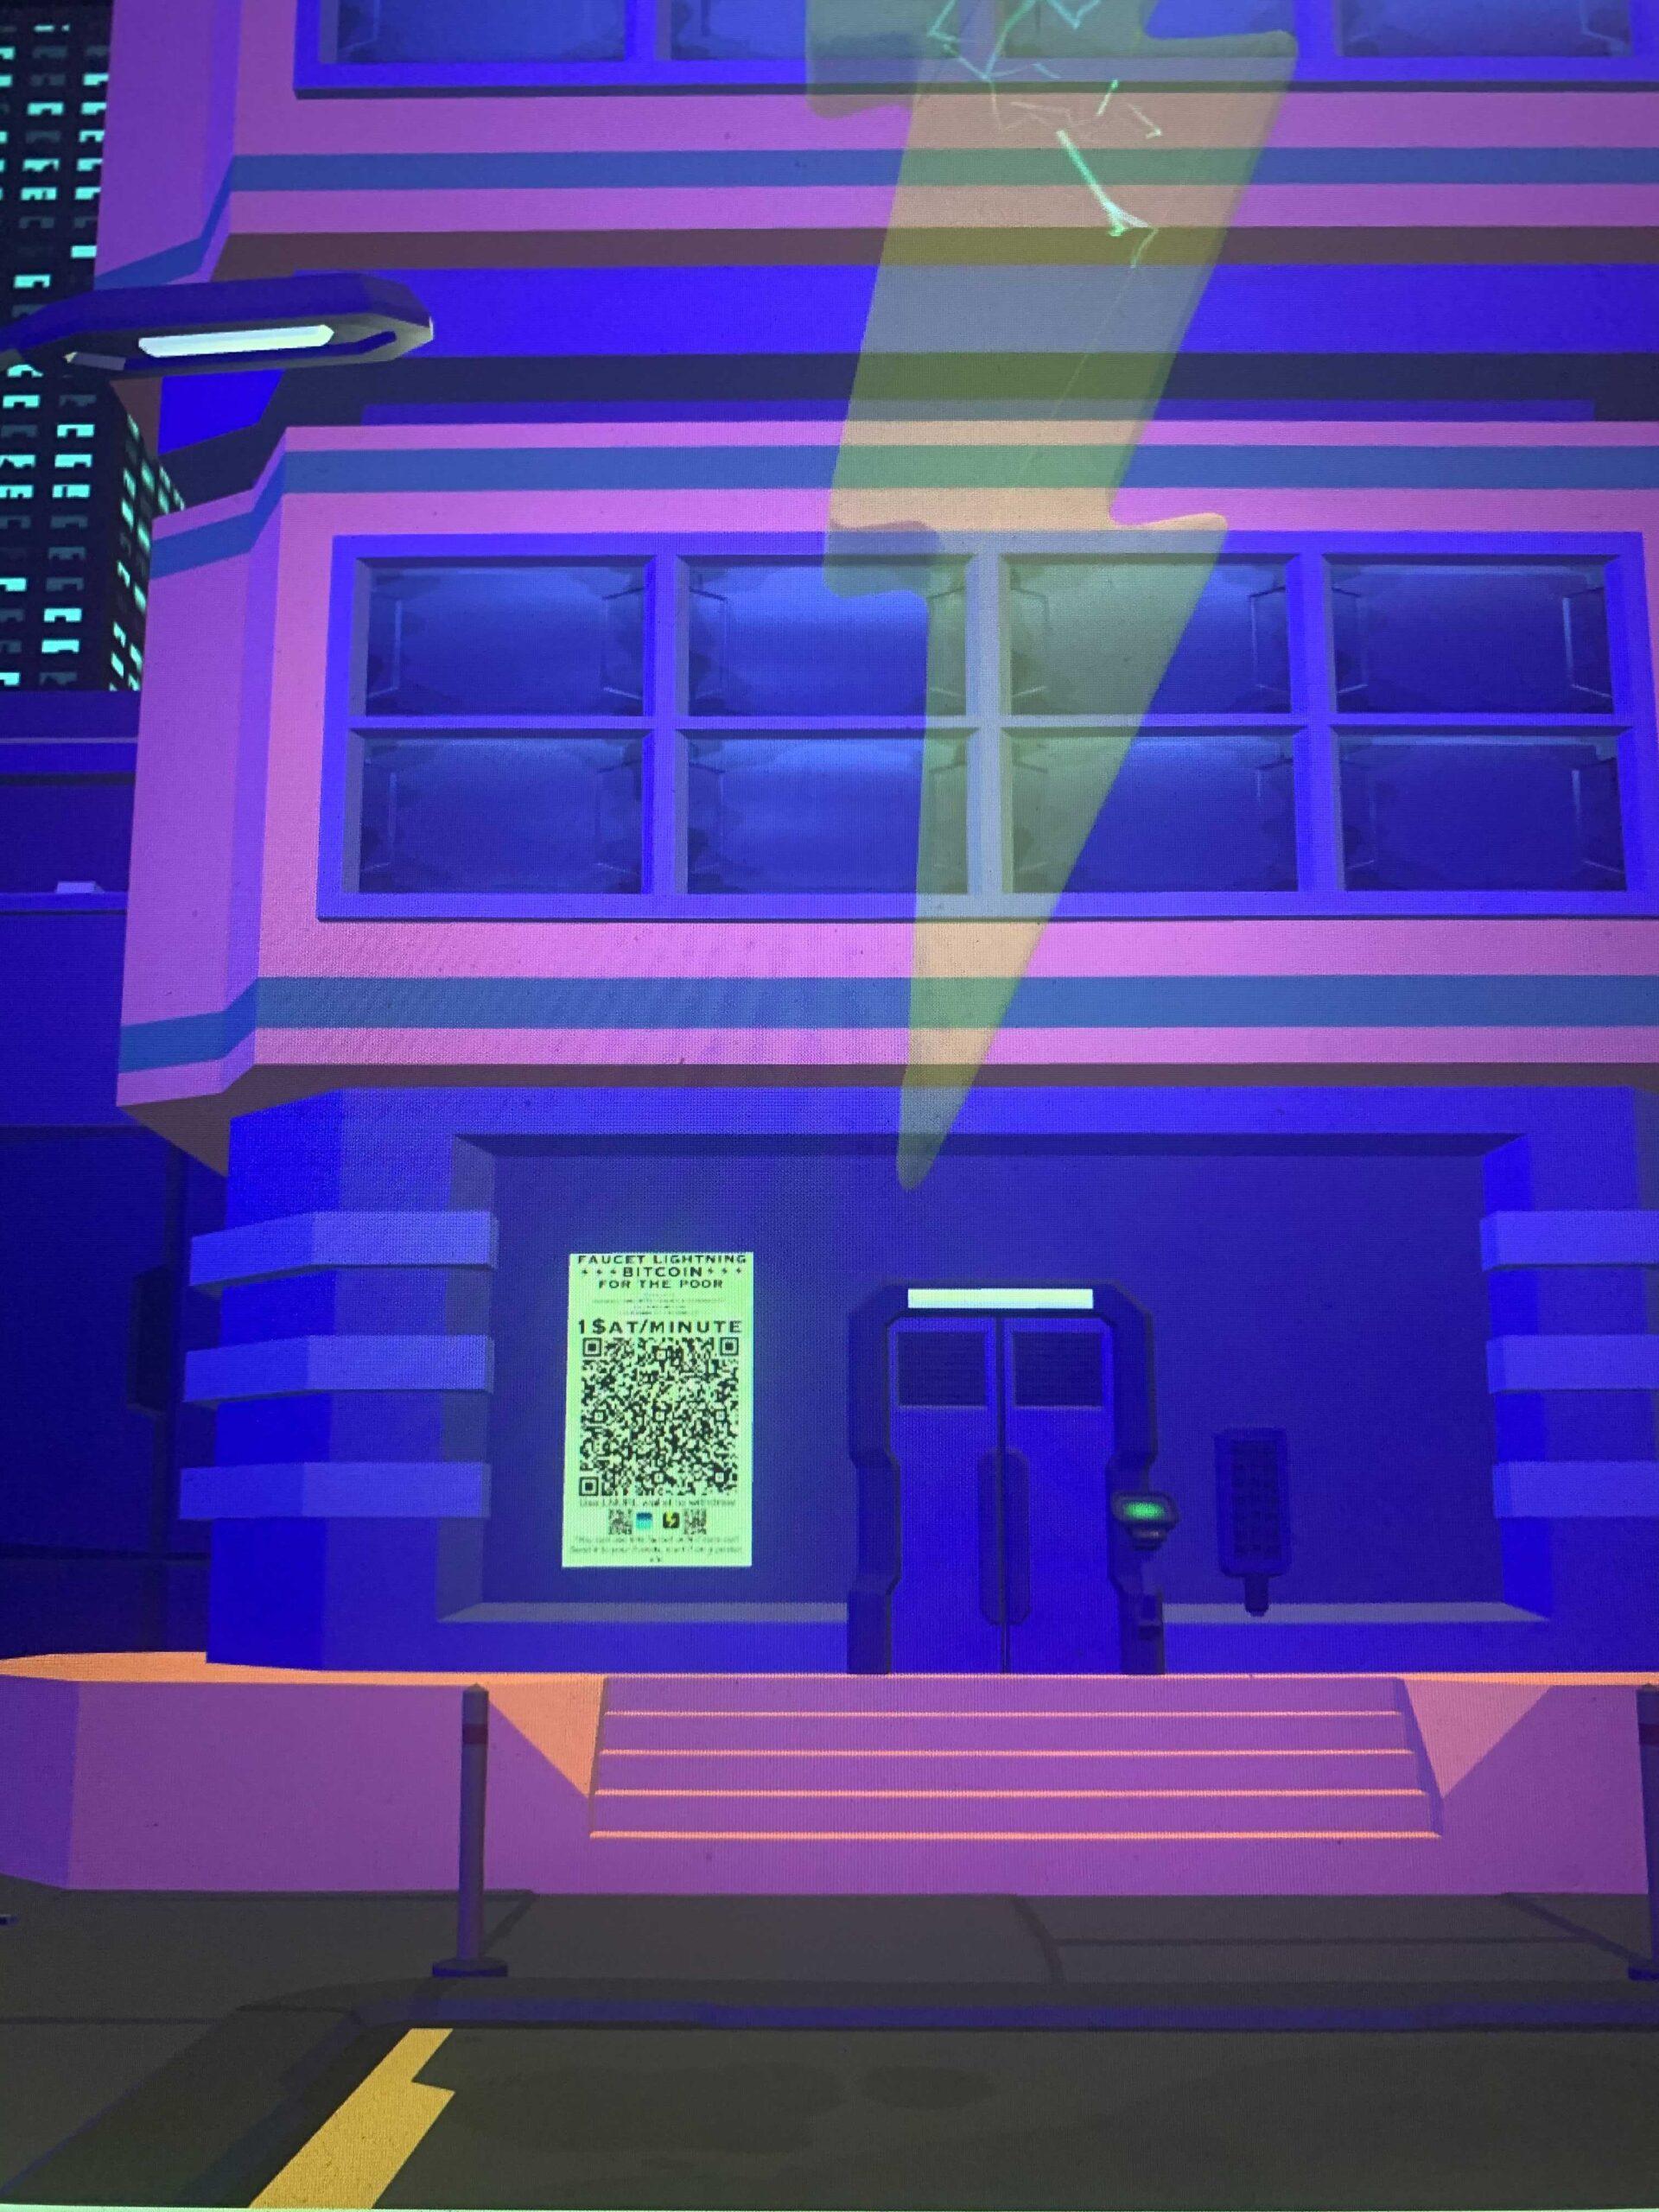 Bitcoin Cyber City building